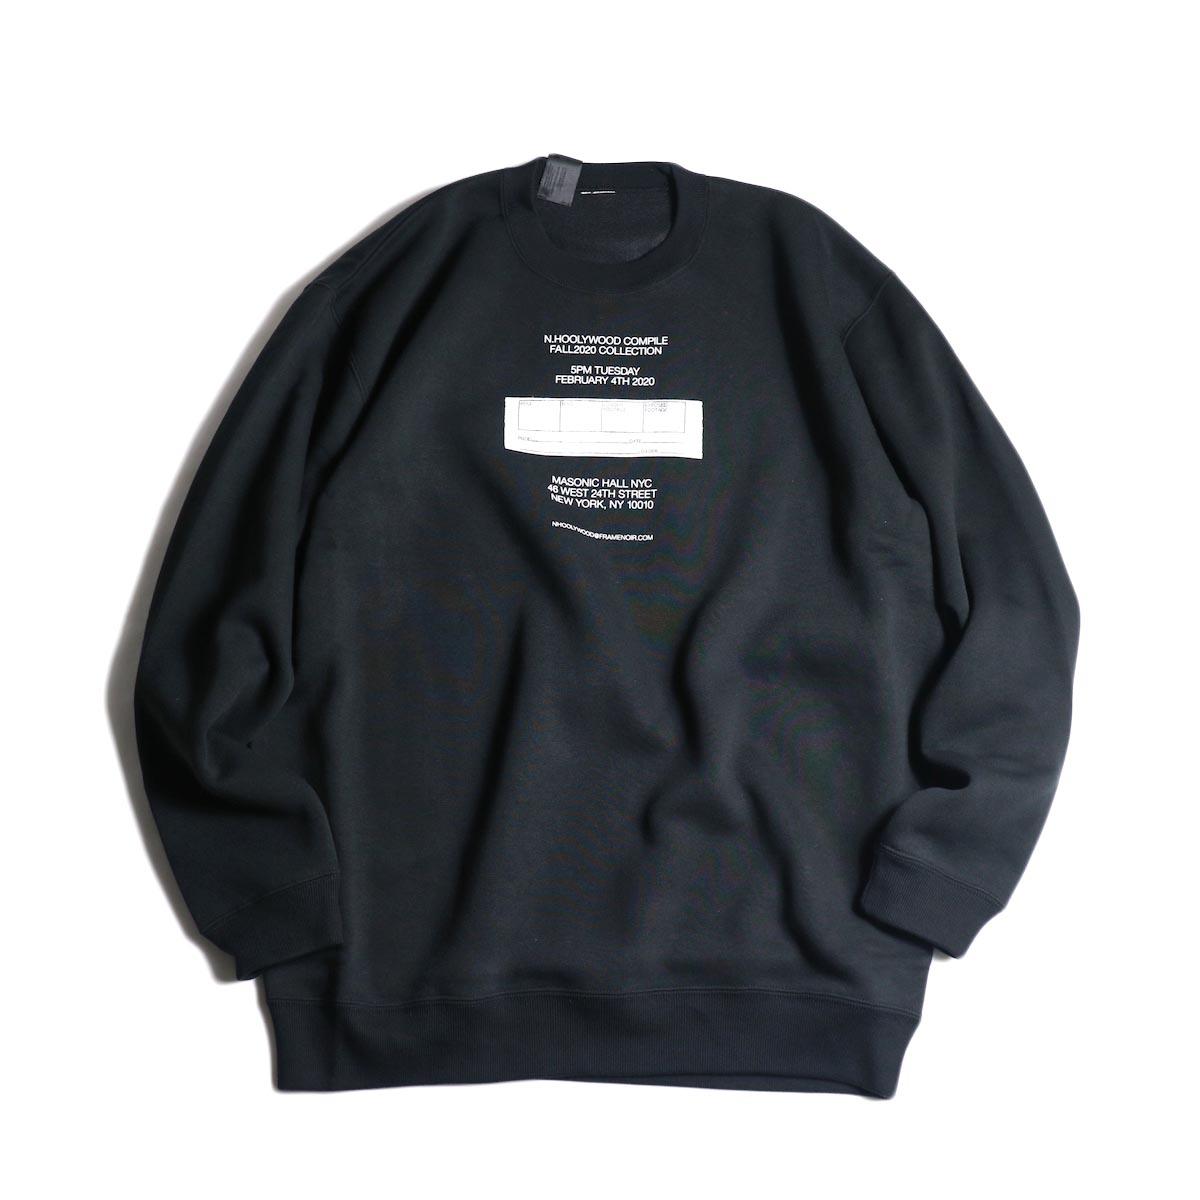 N.HOOLYWOOD / 2202-CS81-033 Sweat Shirt (Black)